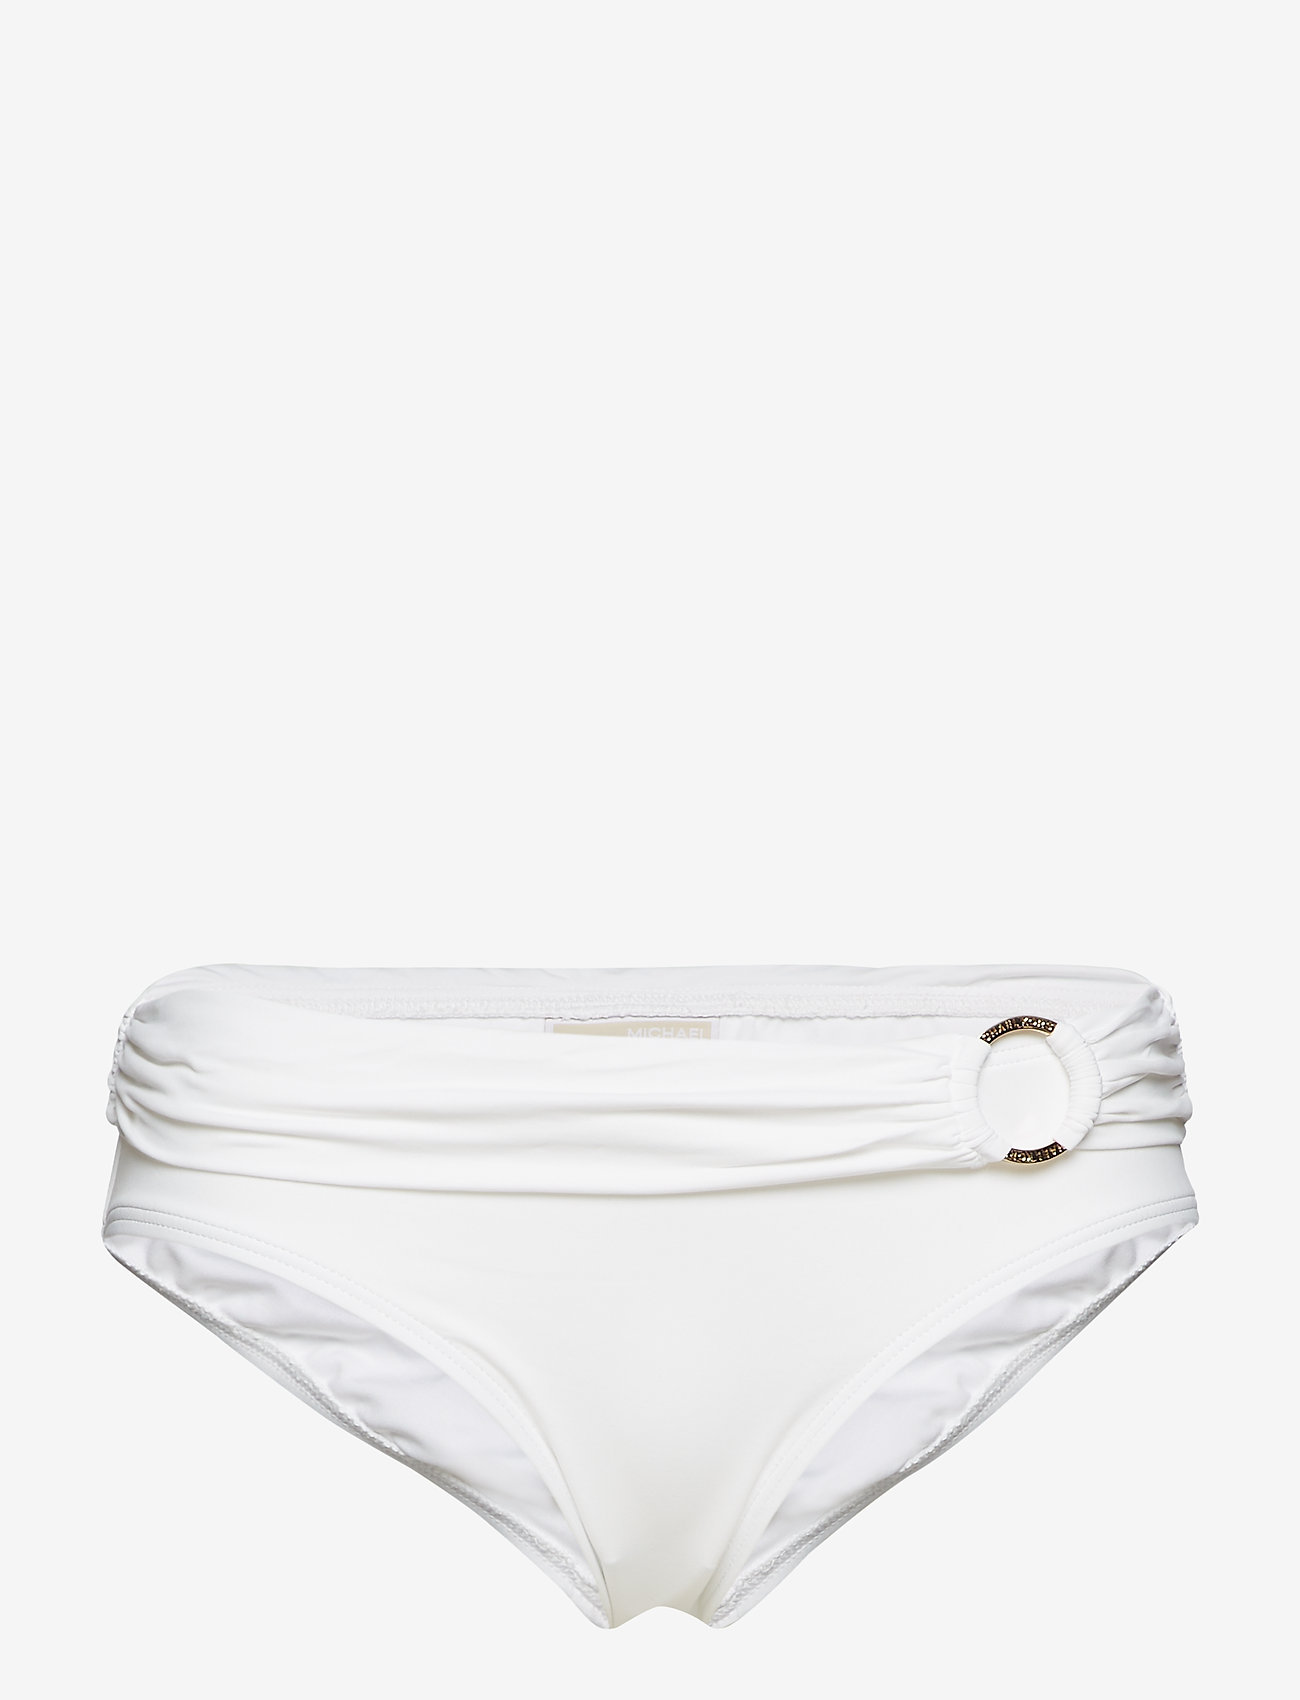 Michael Kors Swimwear - BIKINI BTM - bikinibroekjes - white - 0